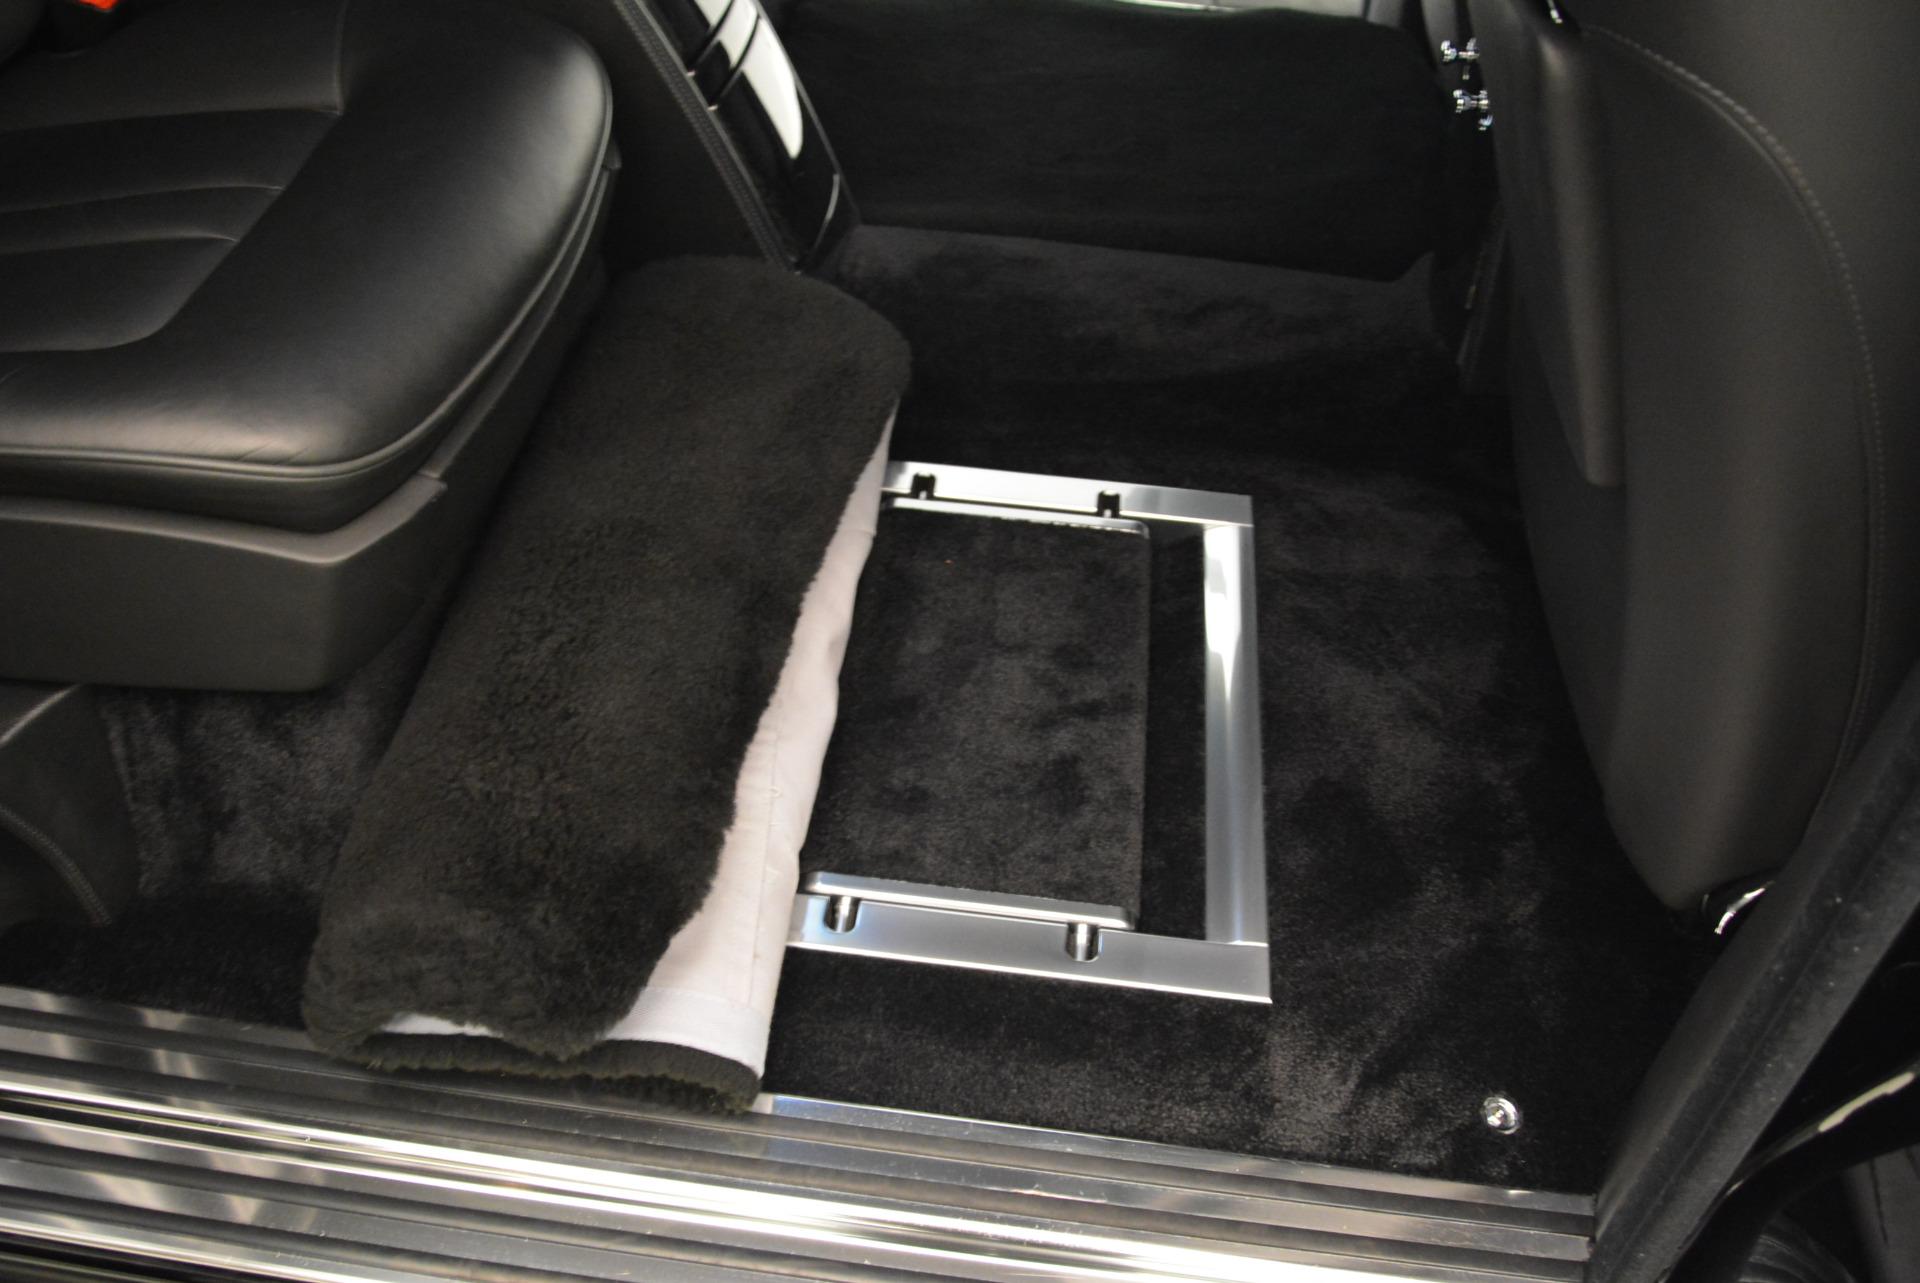 Used 2014 Rolls-Royce Phantom EWB For Sale In Greenwich, CT. Alfa Romeo of Greenwich, 7319 2051_p18